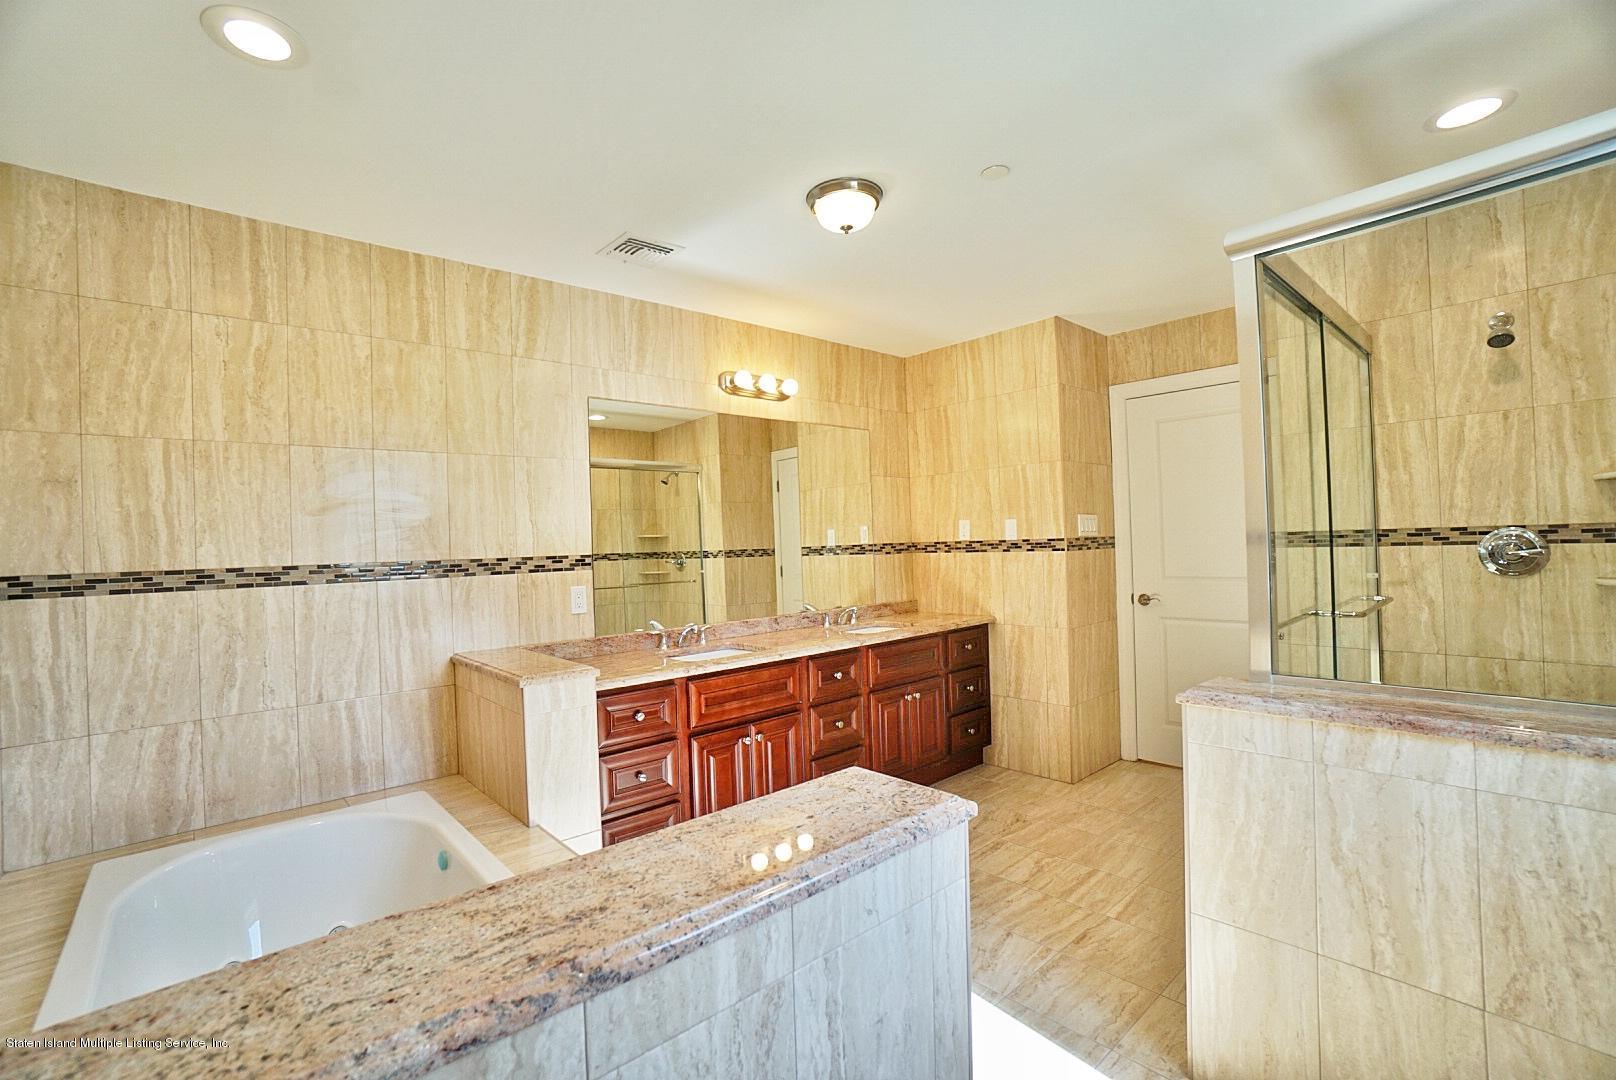 Single Family - Detached 678 Yetman Avenue  Staten Island, NY 10307, MLS-1132766-56